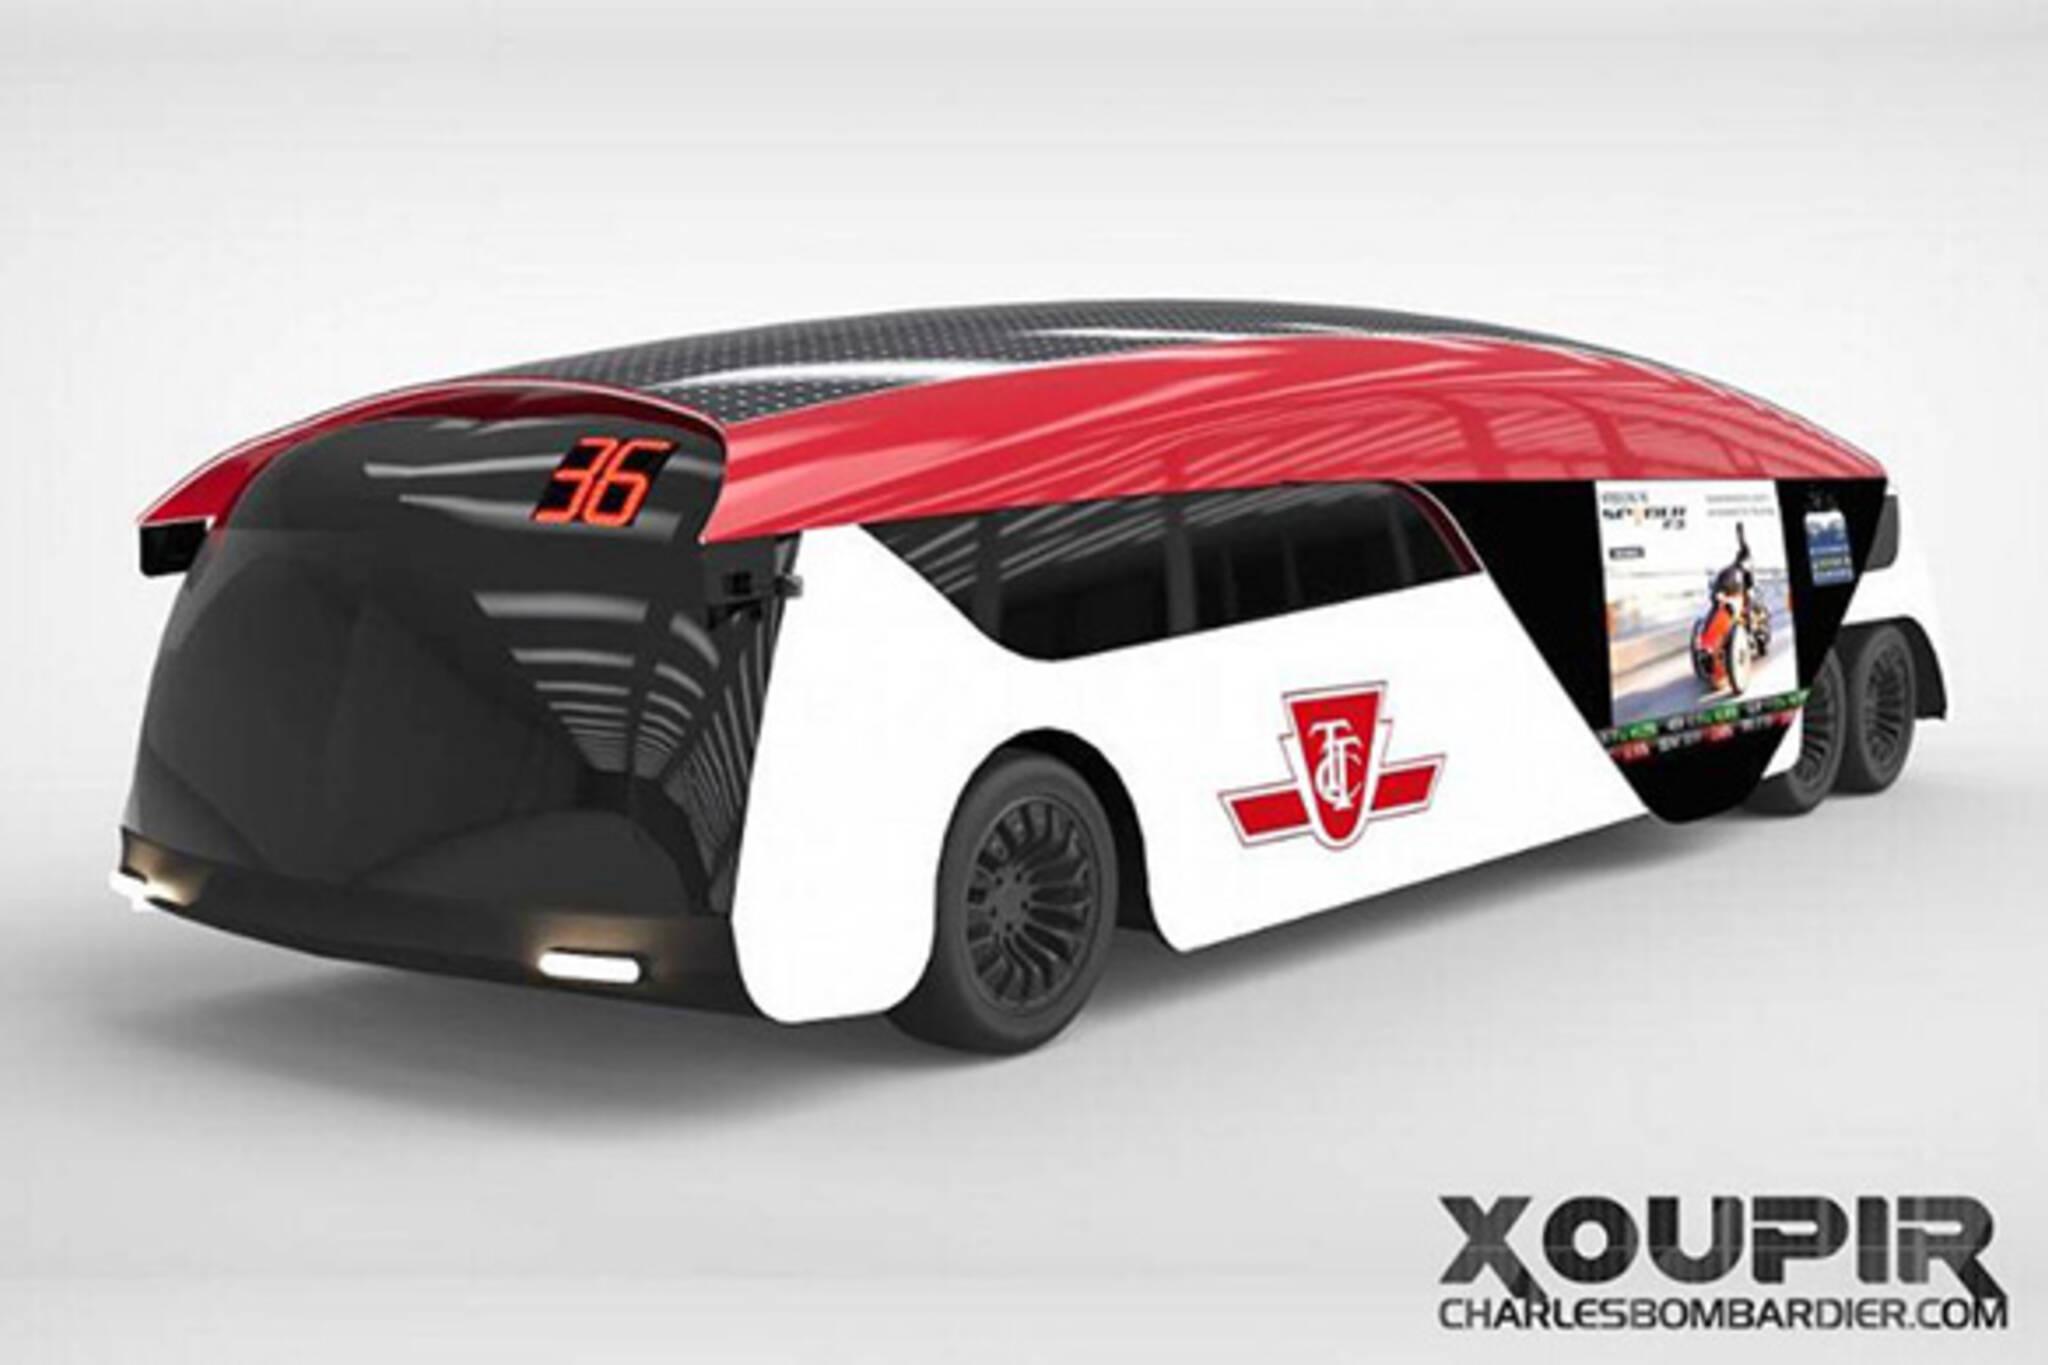 Xoupir future bus